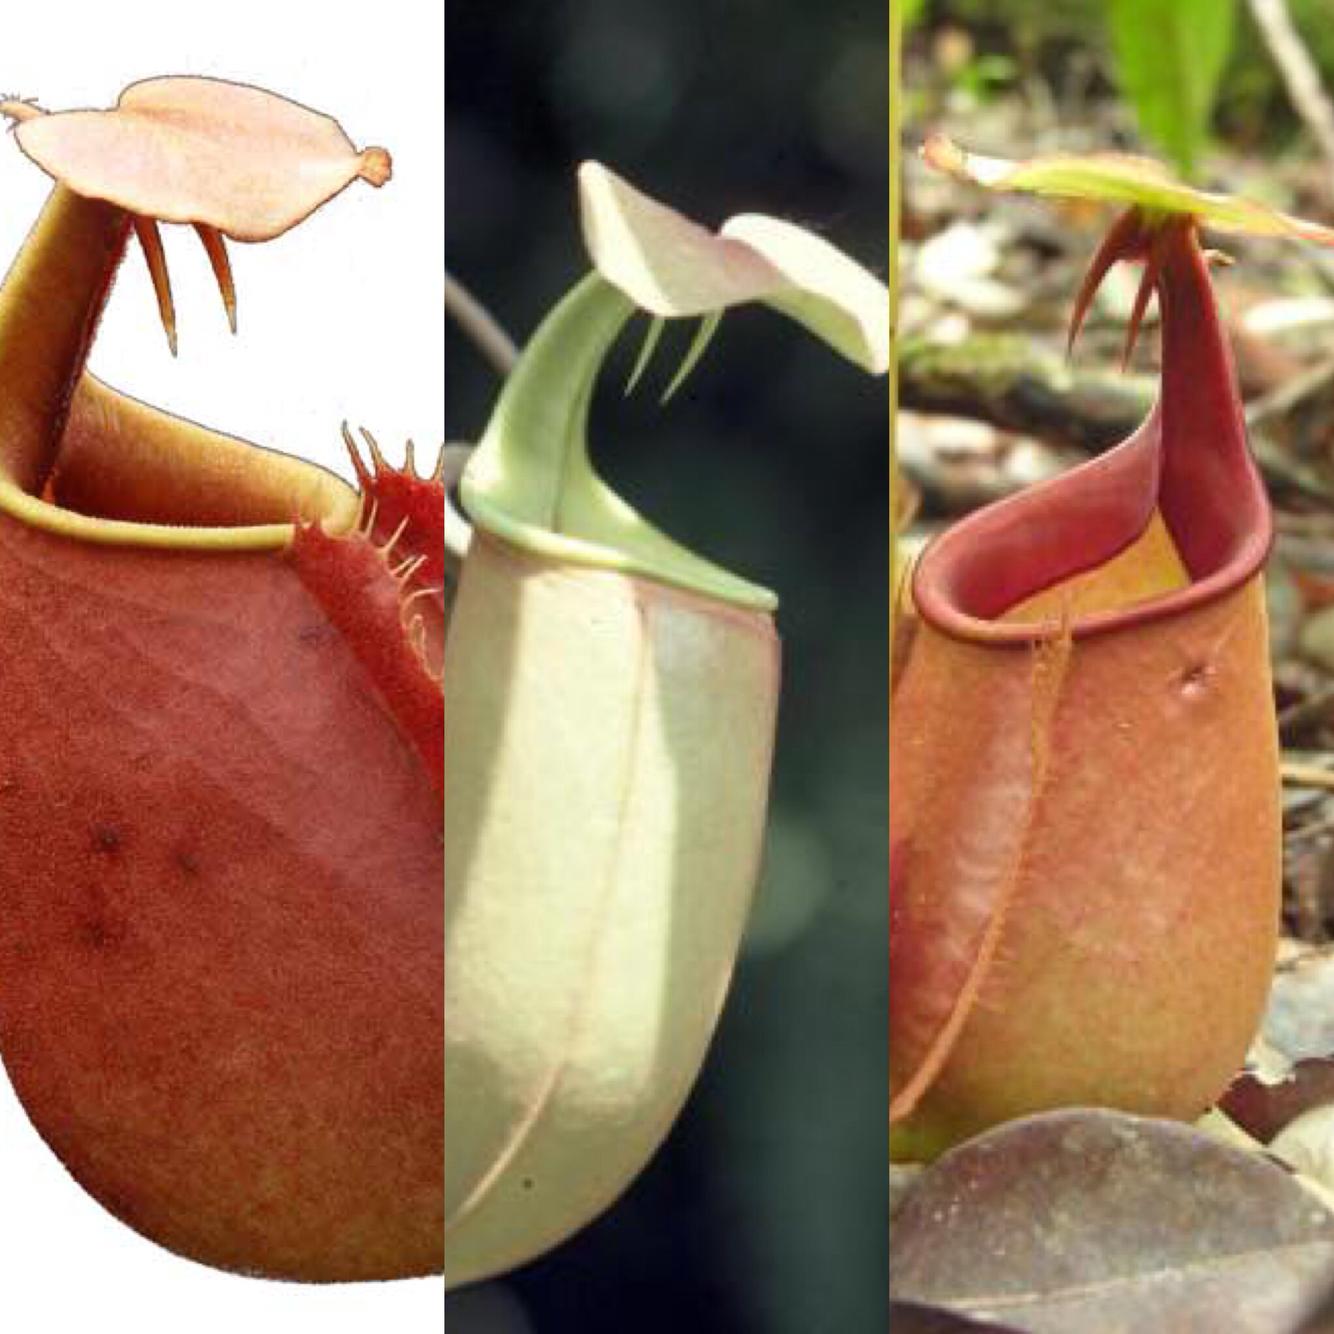 Nepenthes bicalcarata Starter Pack